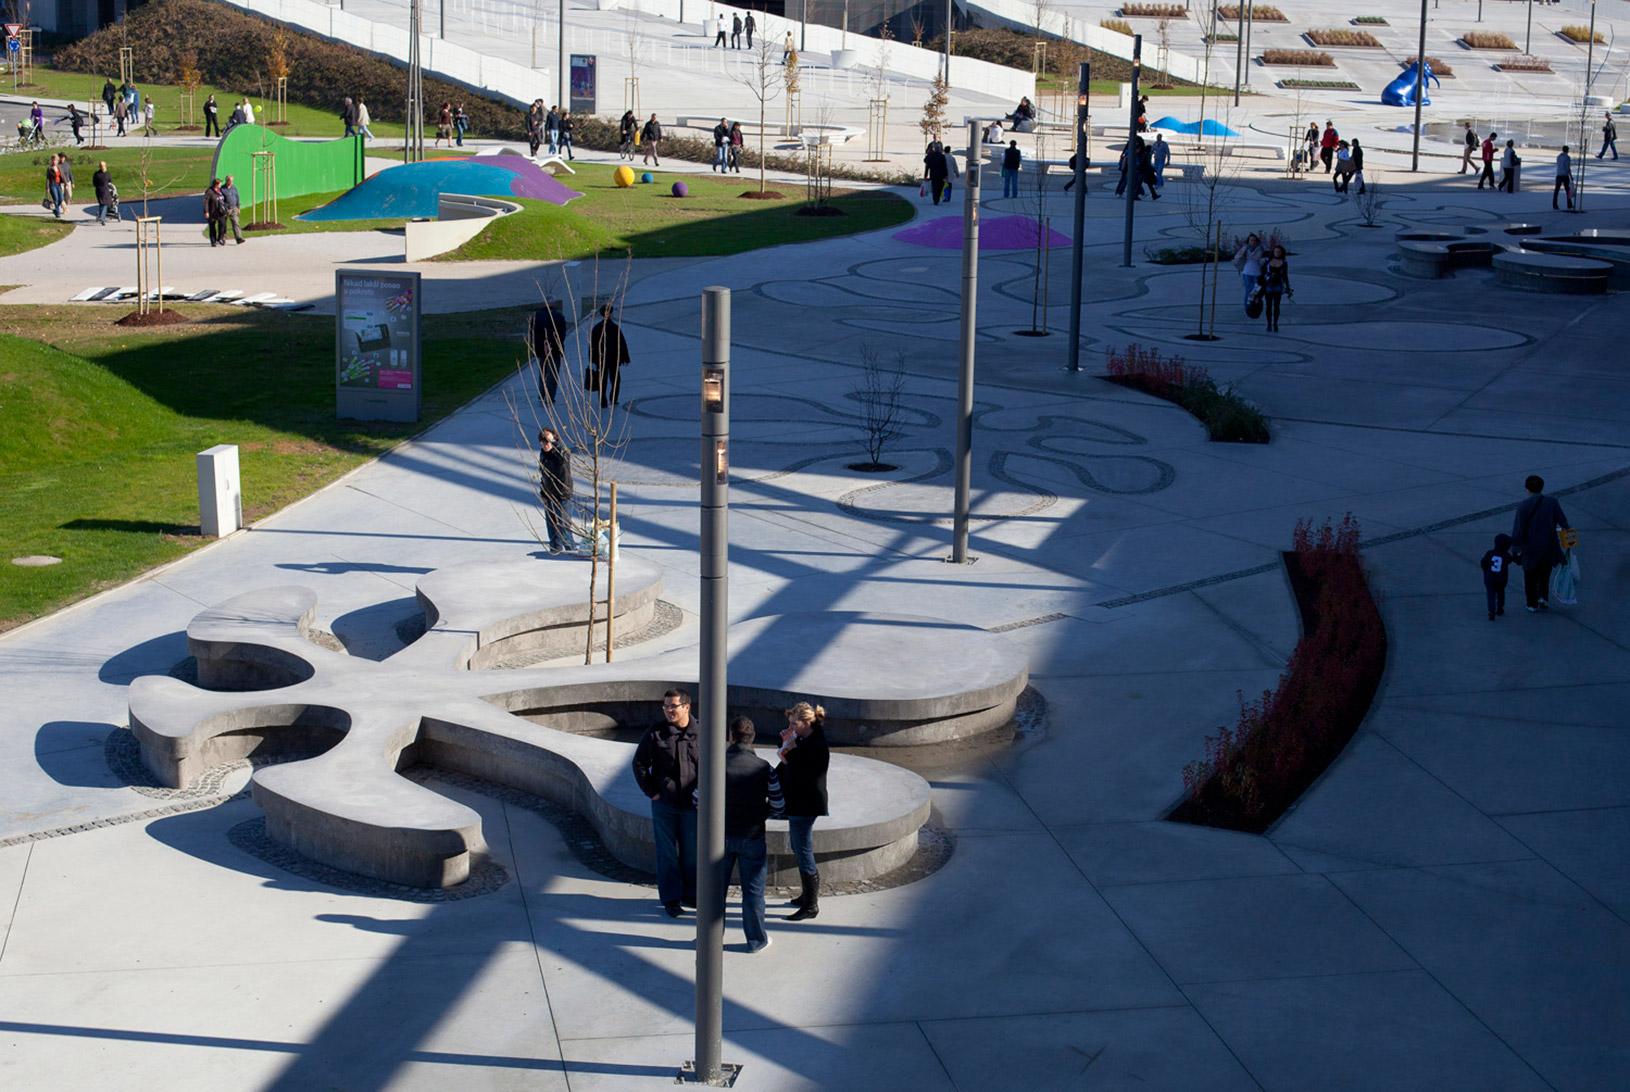 Arena Centar Lanište, UPI-2M, arhitektura, architecture, shopping mall, trgovački centar, urbanizam, urban planning